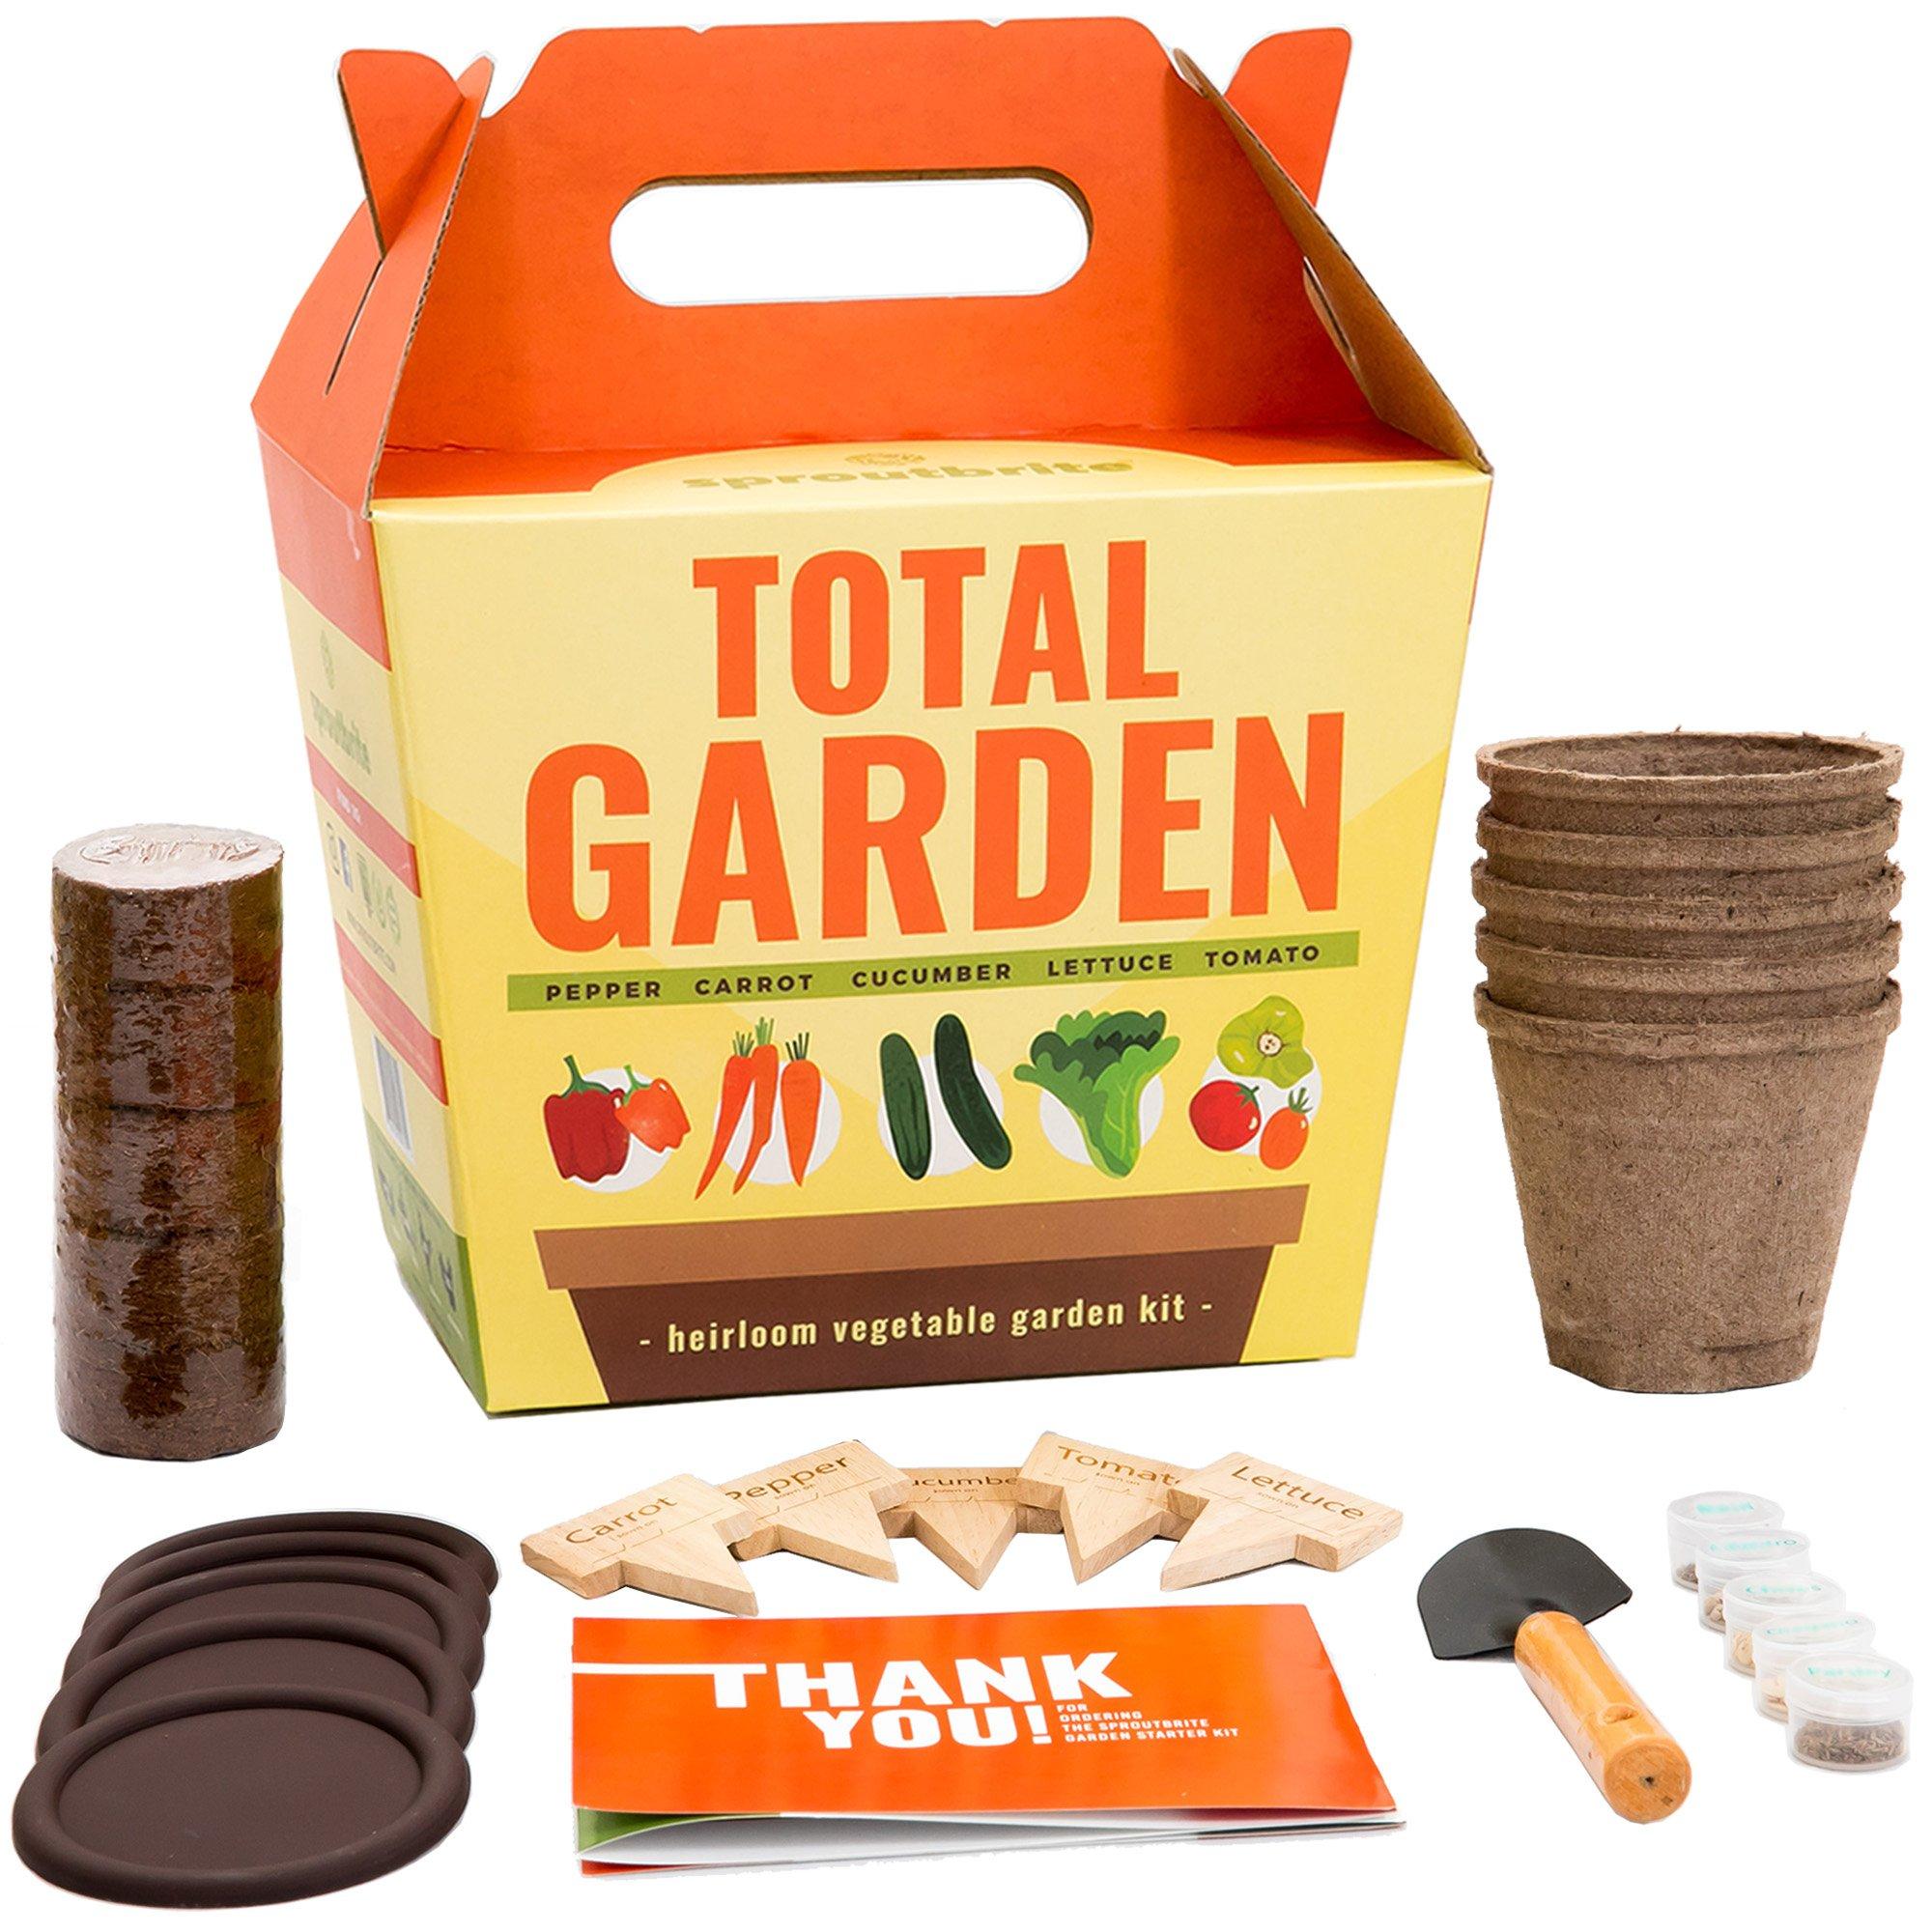 Sproutbrite Vegetable Garden Starter Kit - Gardening Gift - Complete DIY Growing Kit - Easiest Way to Start Growing Heirloom Veggies from Seed by Sproutbrite